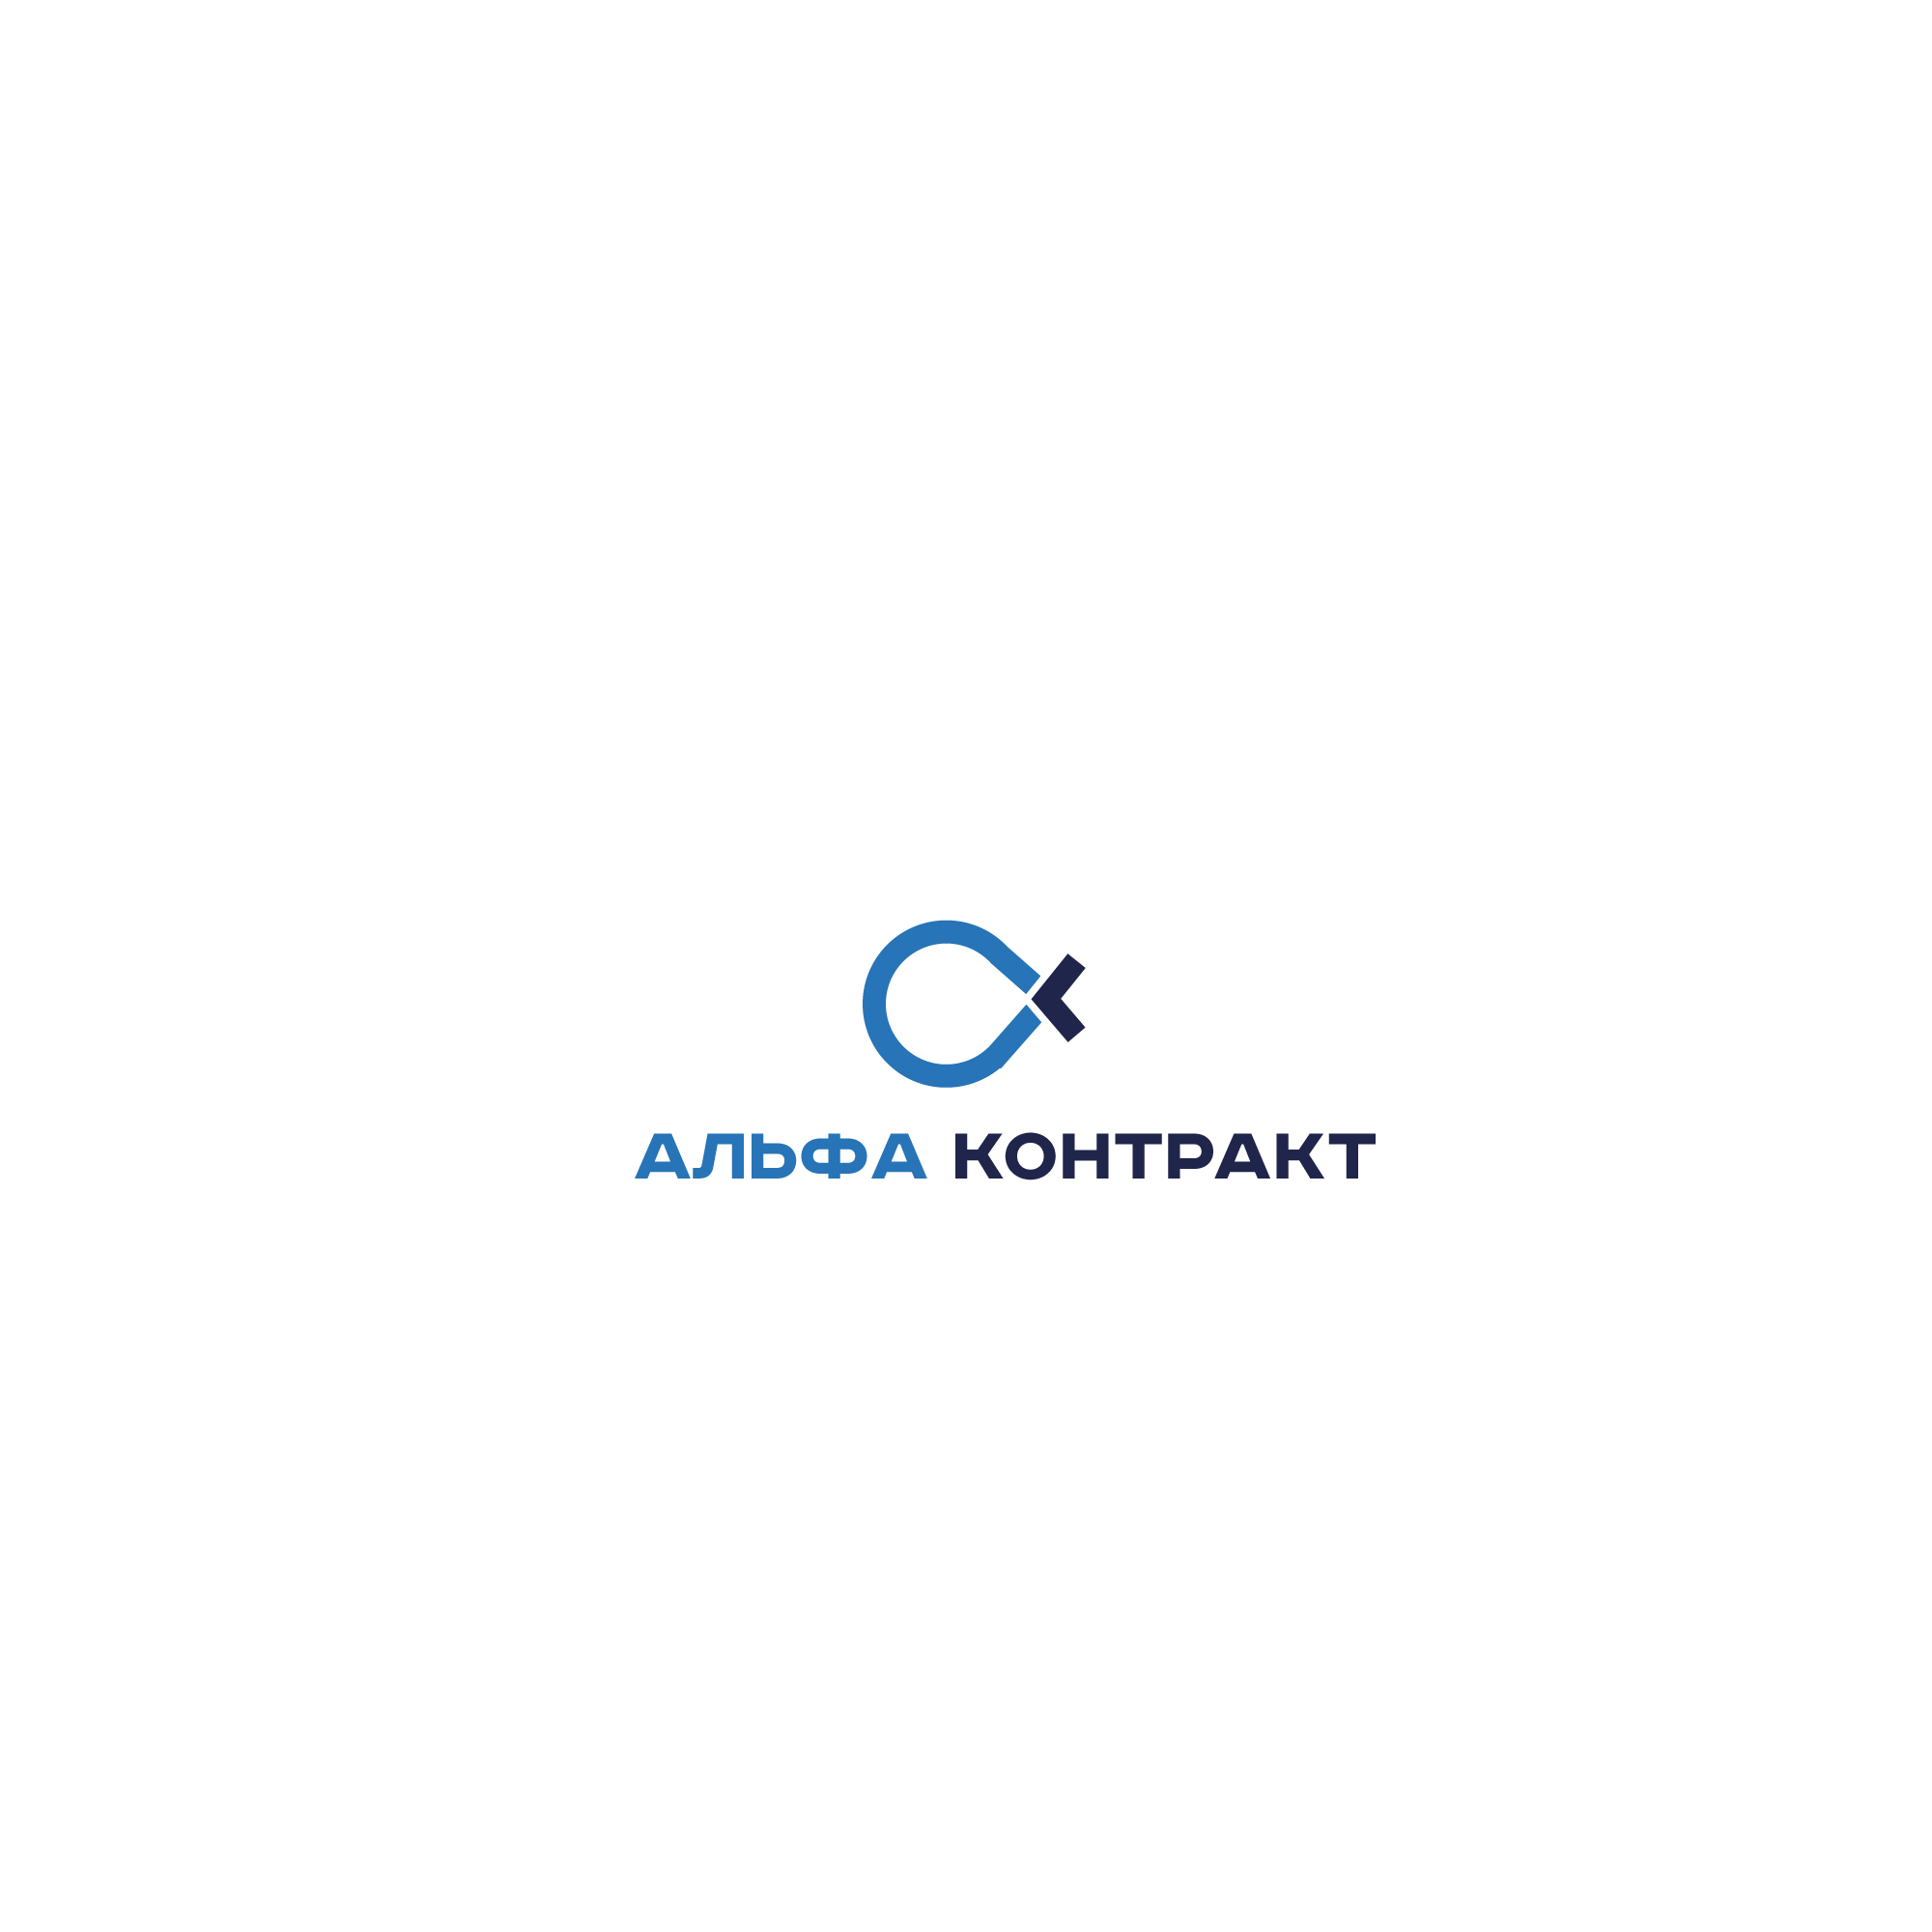 Дизайнер для разработки логотипа компании фото f_3985bfd2cf5c6d6b.jpg